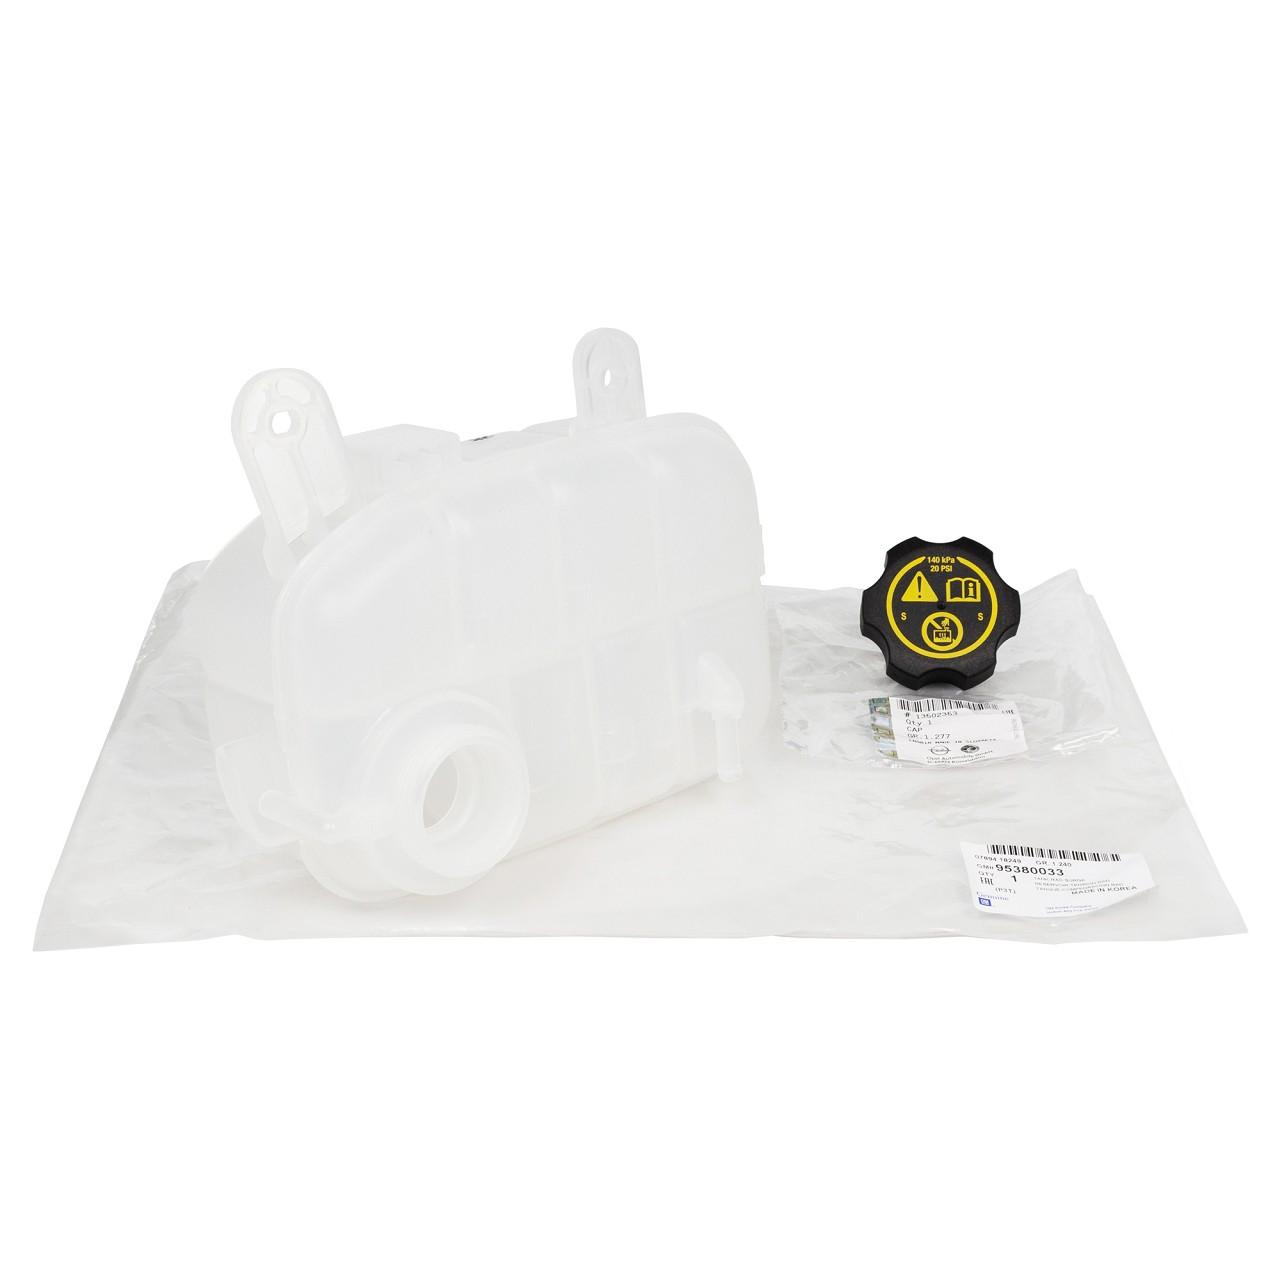 ORIGINAL Opel Ausgleichsbehälter Kühlmittel + Deckel MOKKA 95380033 + 13502353